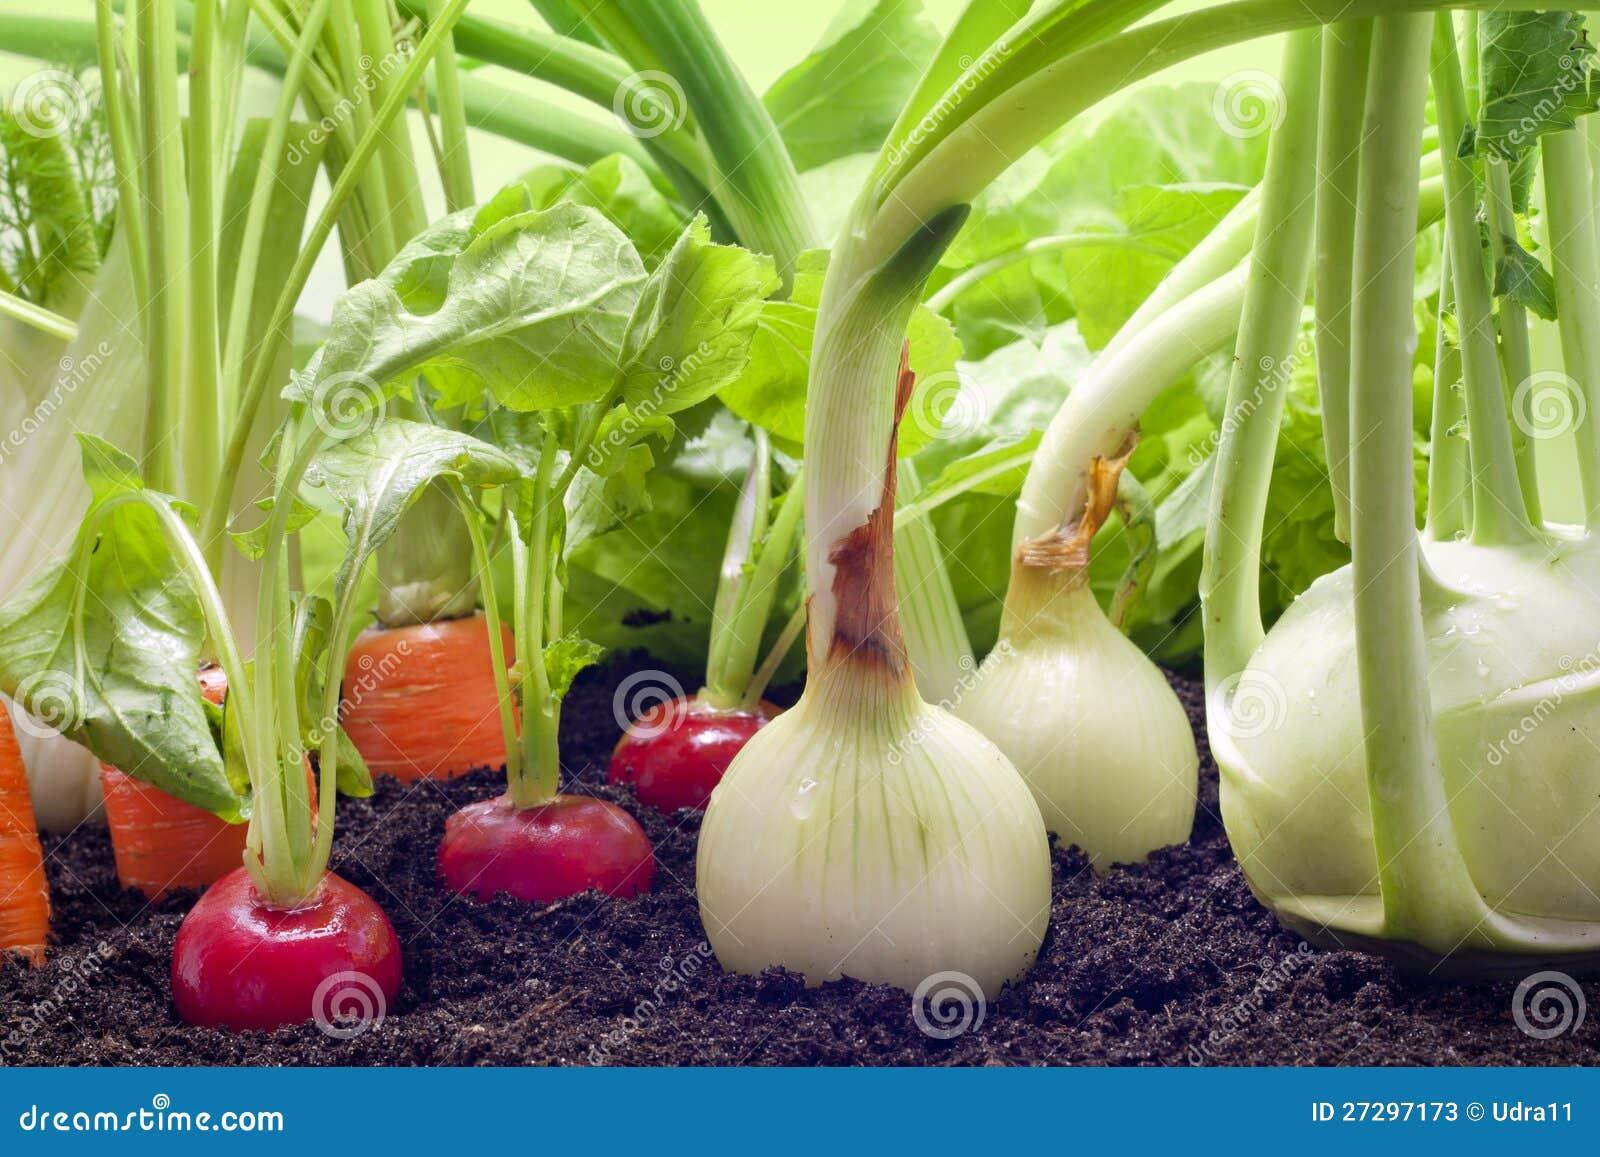 Vegetables growing in the garden stock image image 27297173 for Garden vegetables to grow